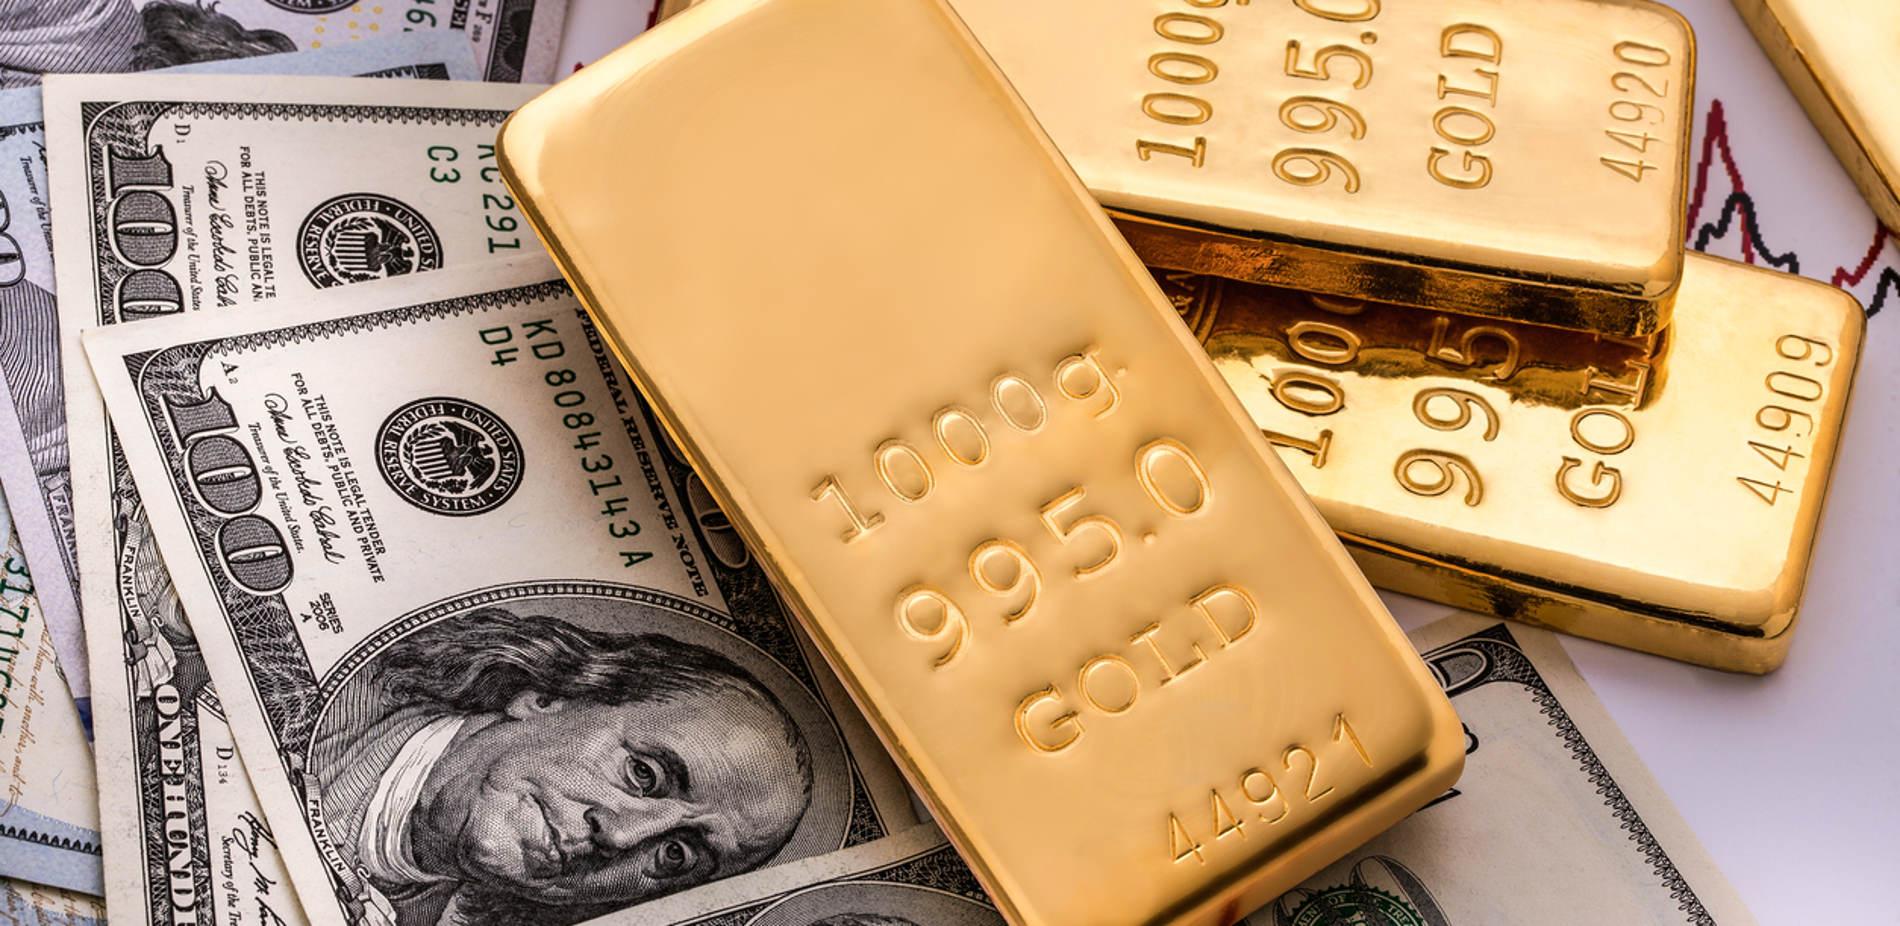 Gold Price Forecast for 2017 Remains Extremely Bullish